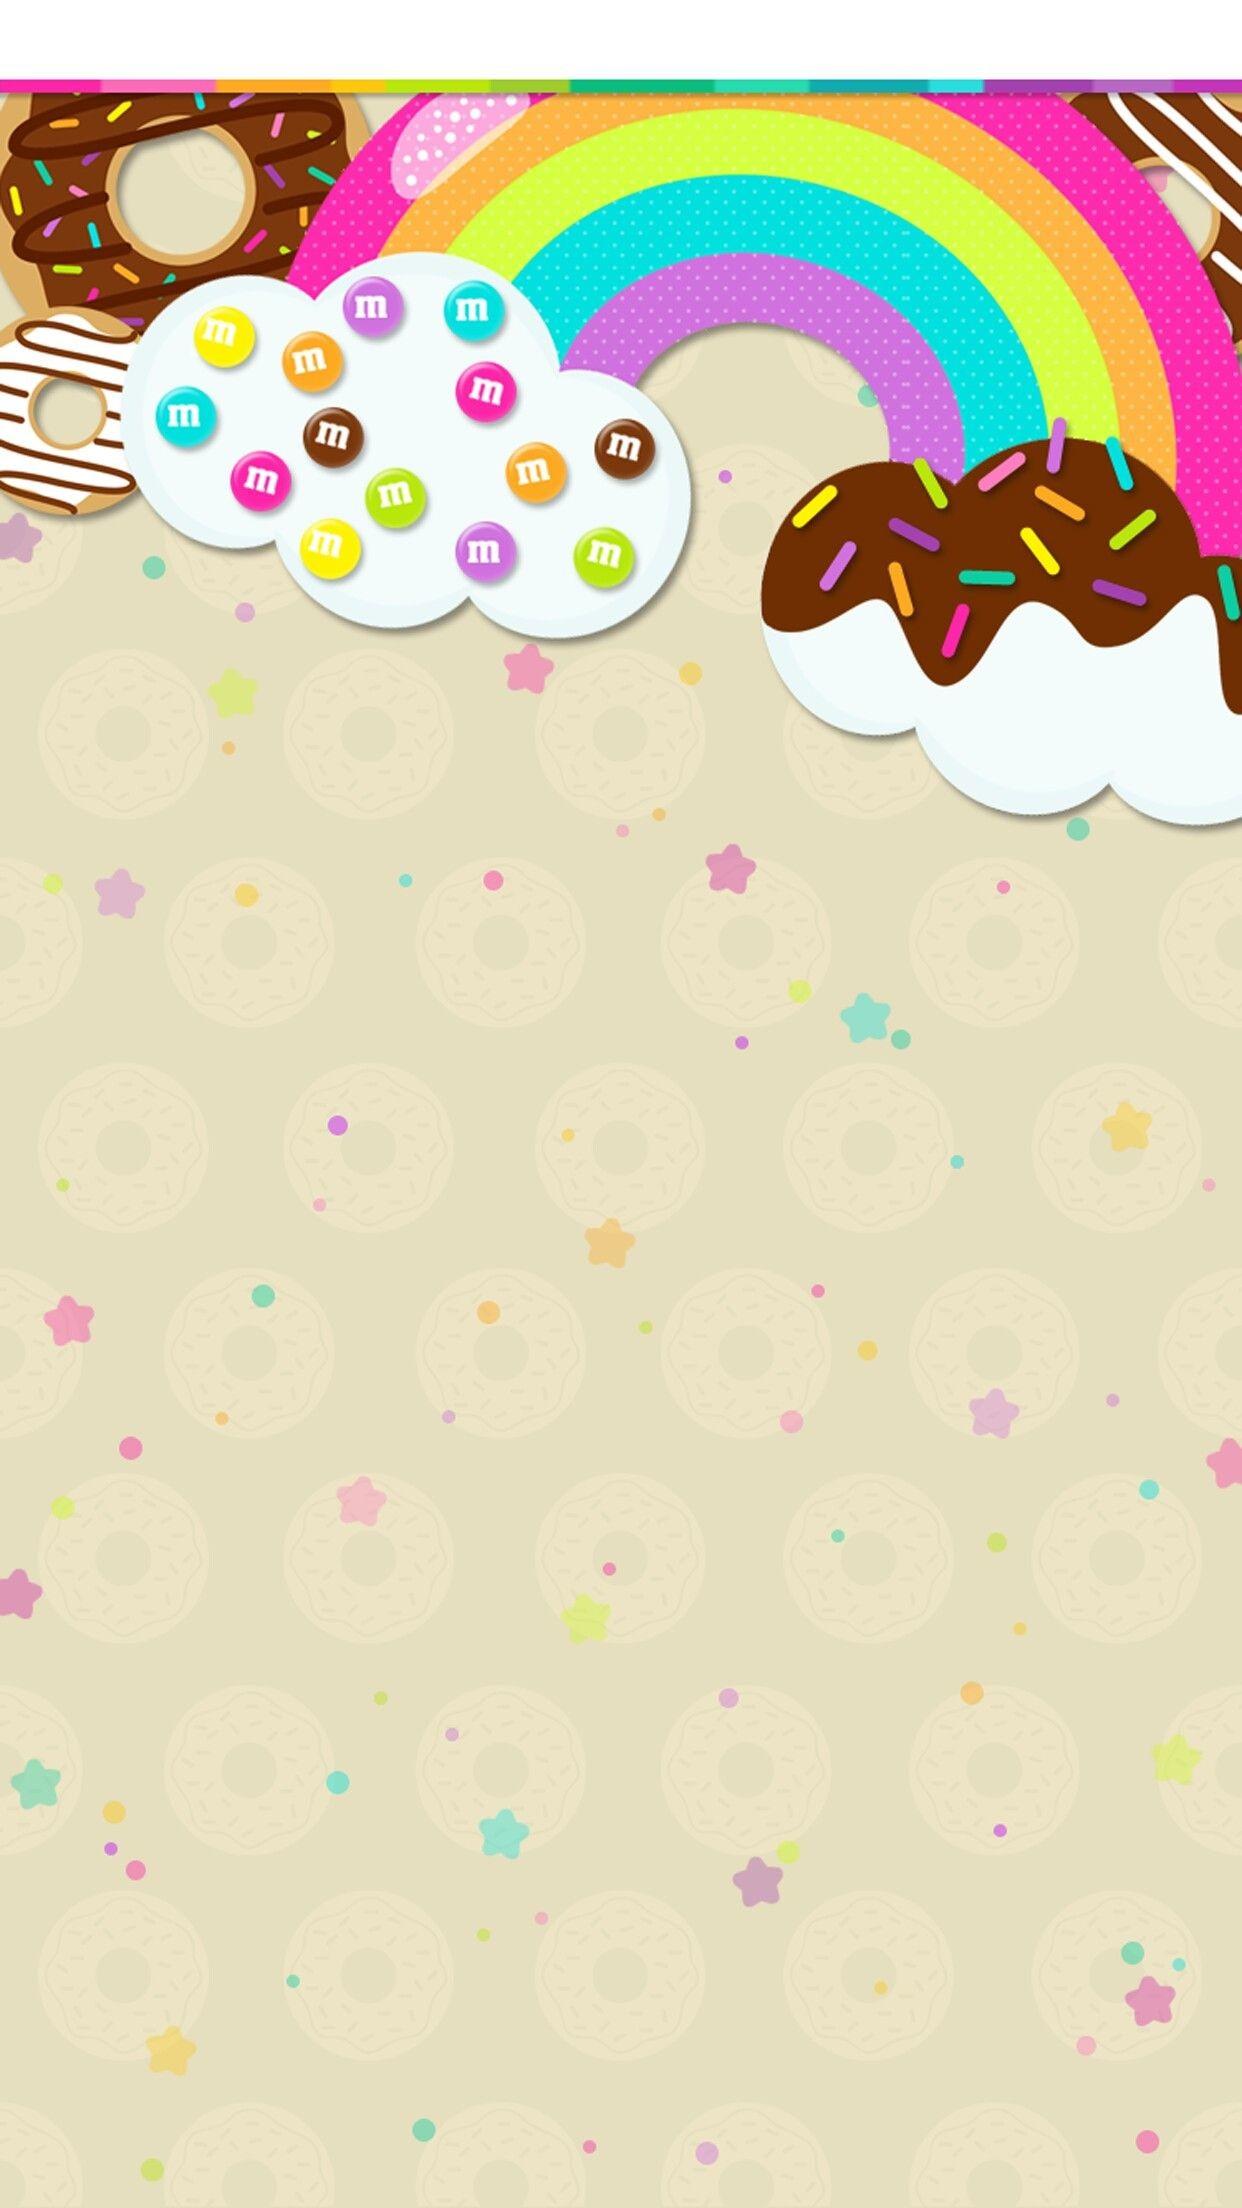 Res: 1242x2208, Candy rainbow delish